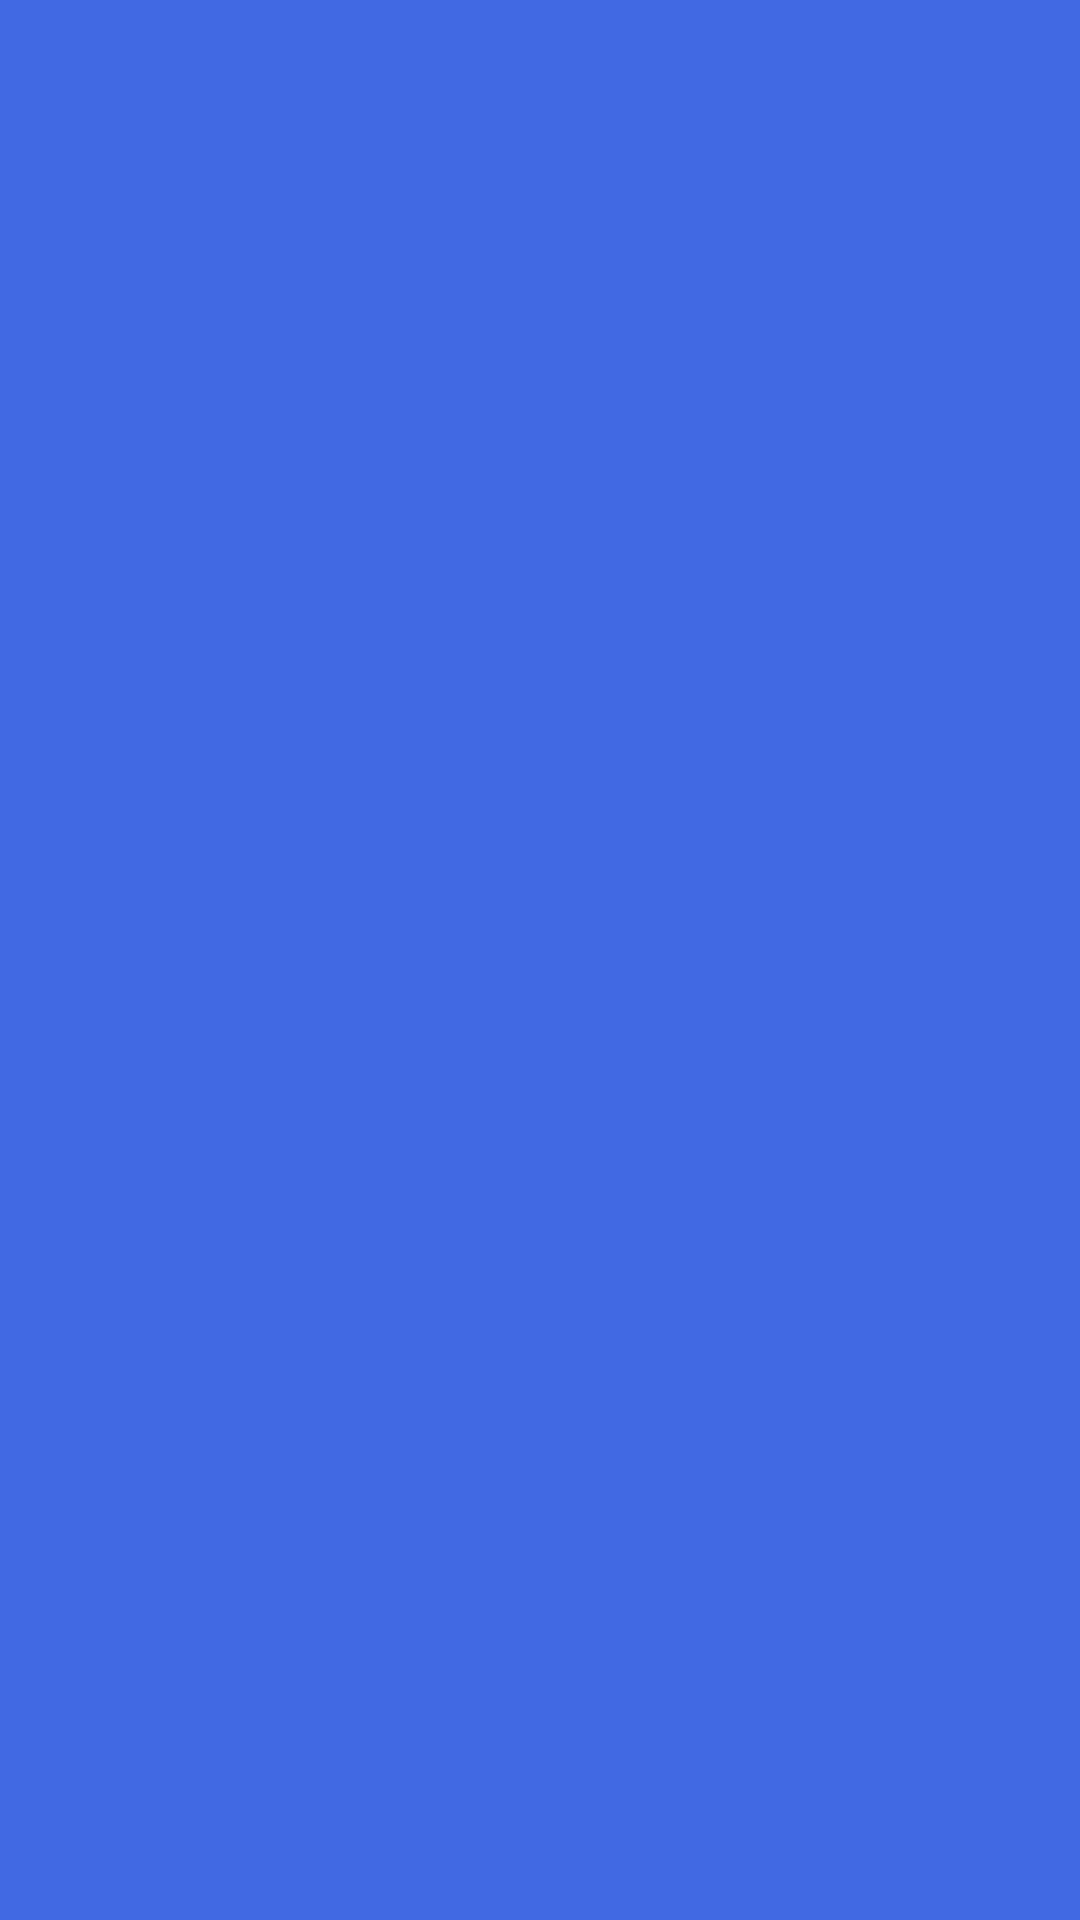 1080x1920 Royal Blue Web Solid Color Background